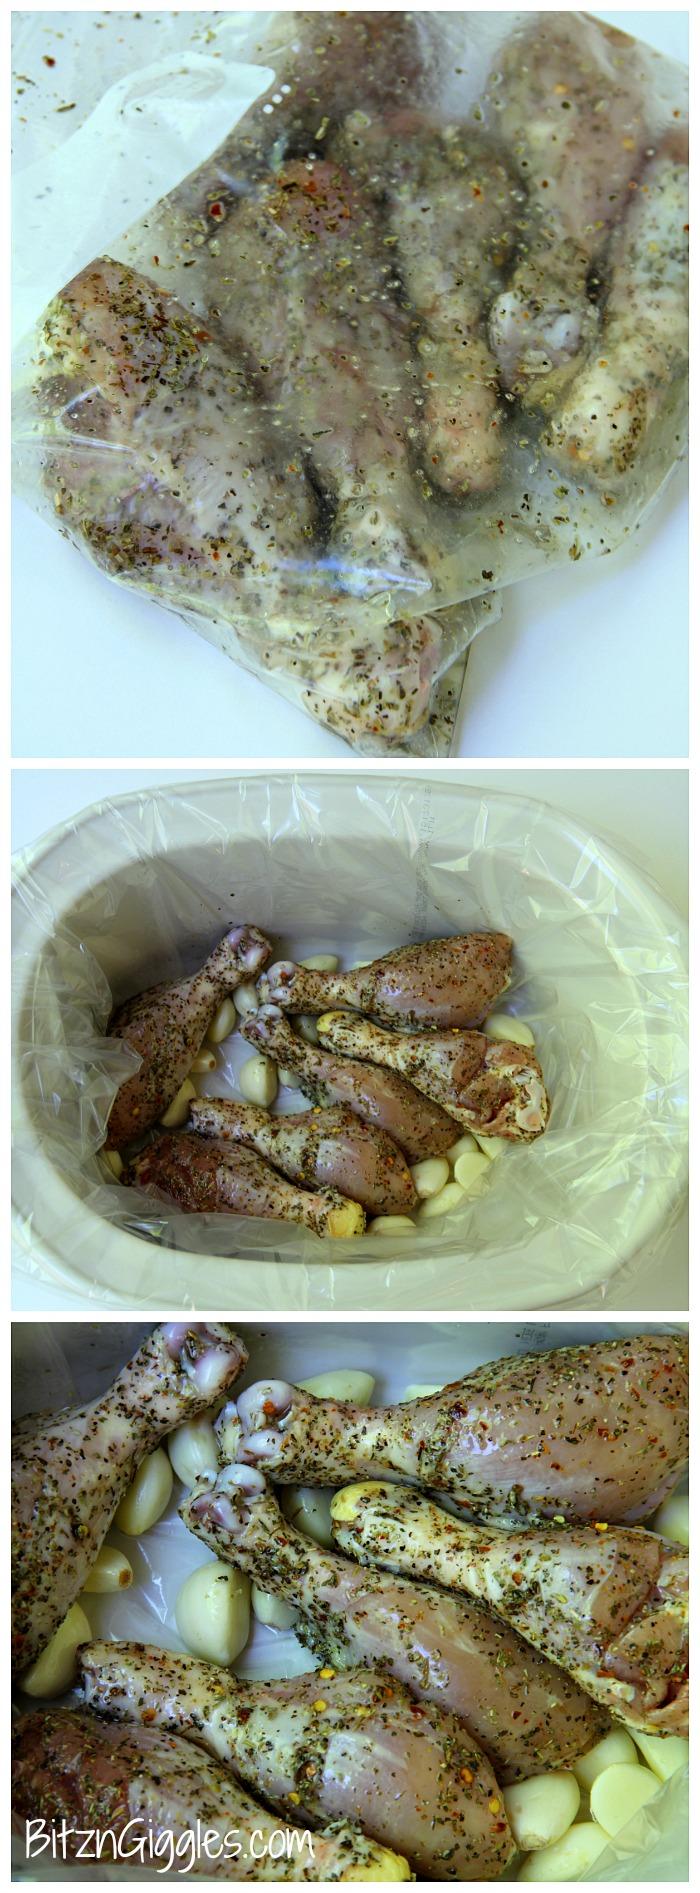 Crock Pot Italian Garlic Chicken - Super moist, tender, fall-off-the-bone chicken the whole family will enjoy!